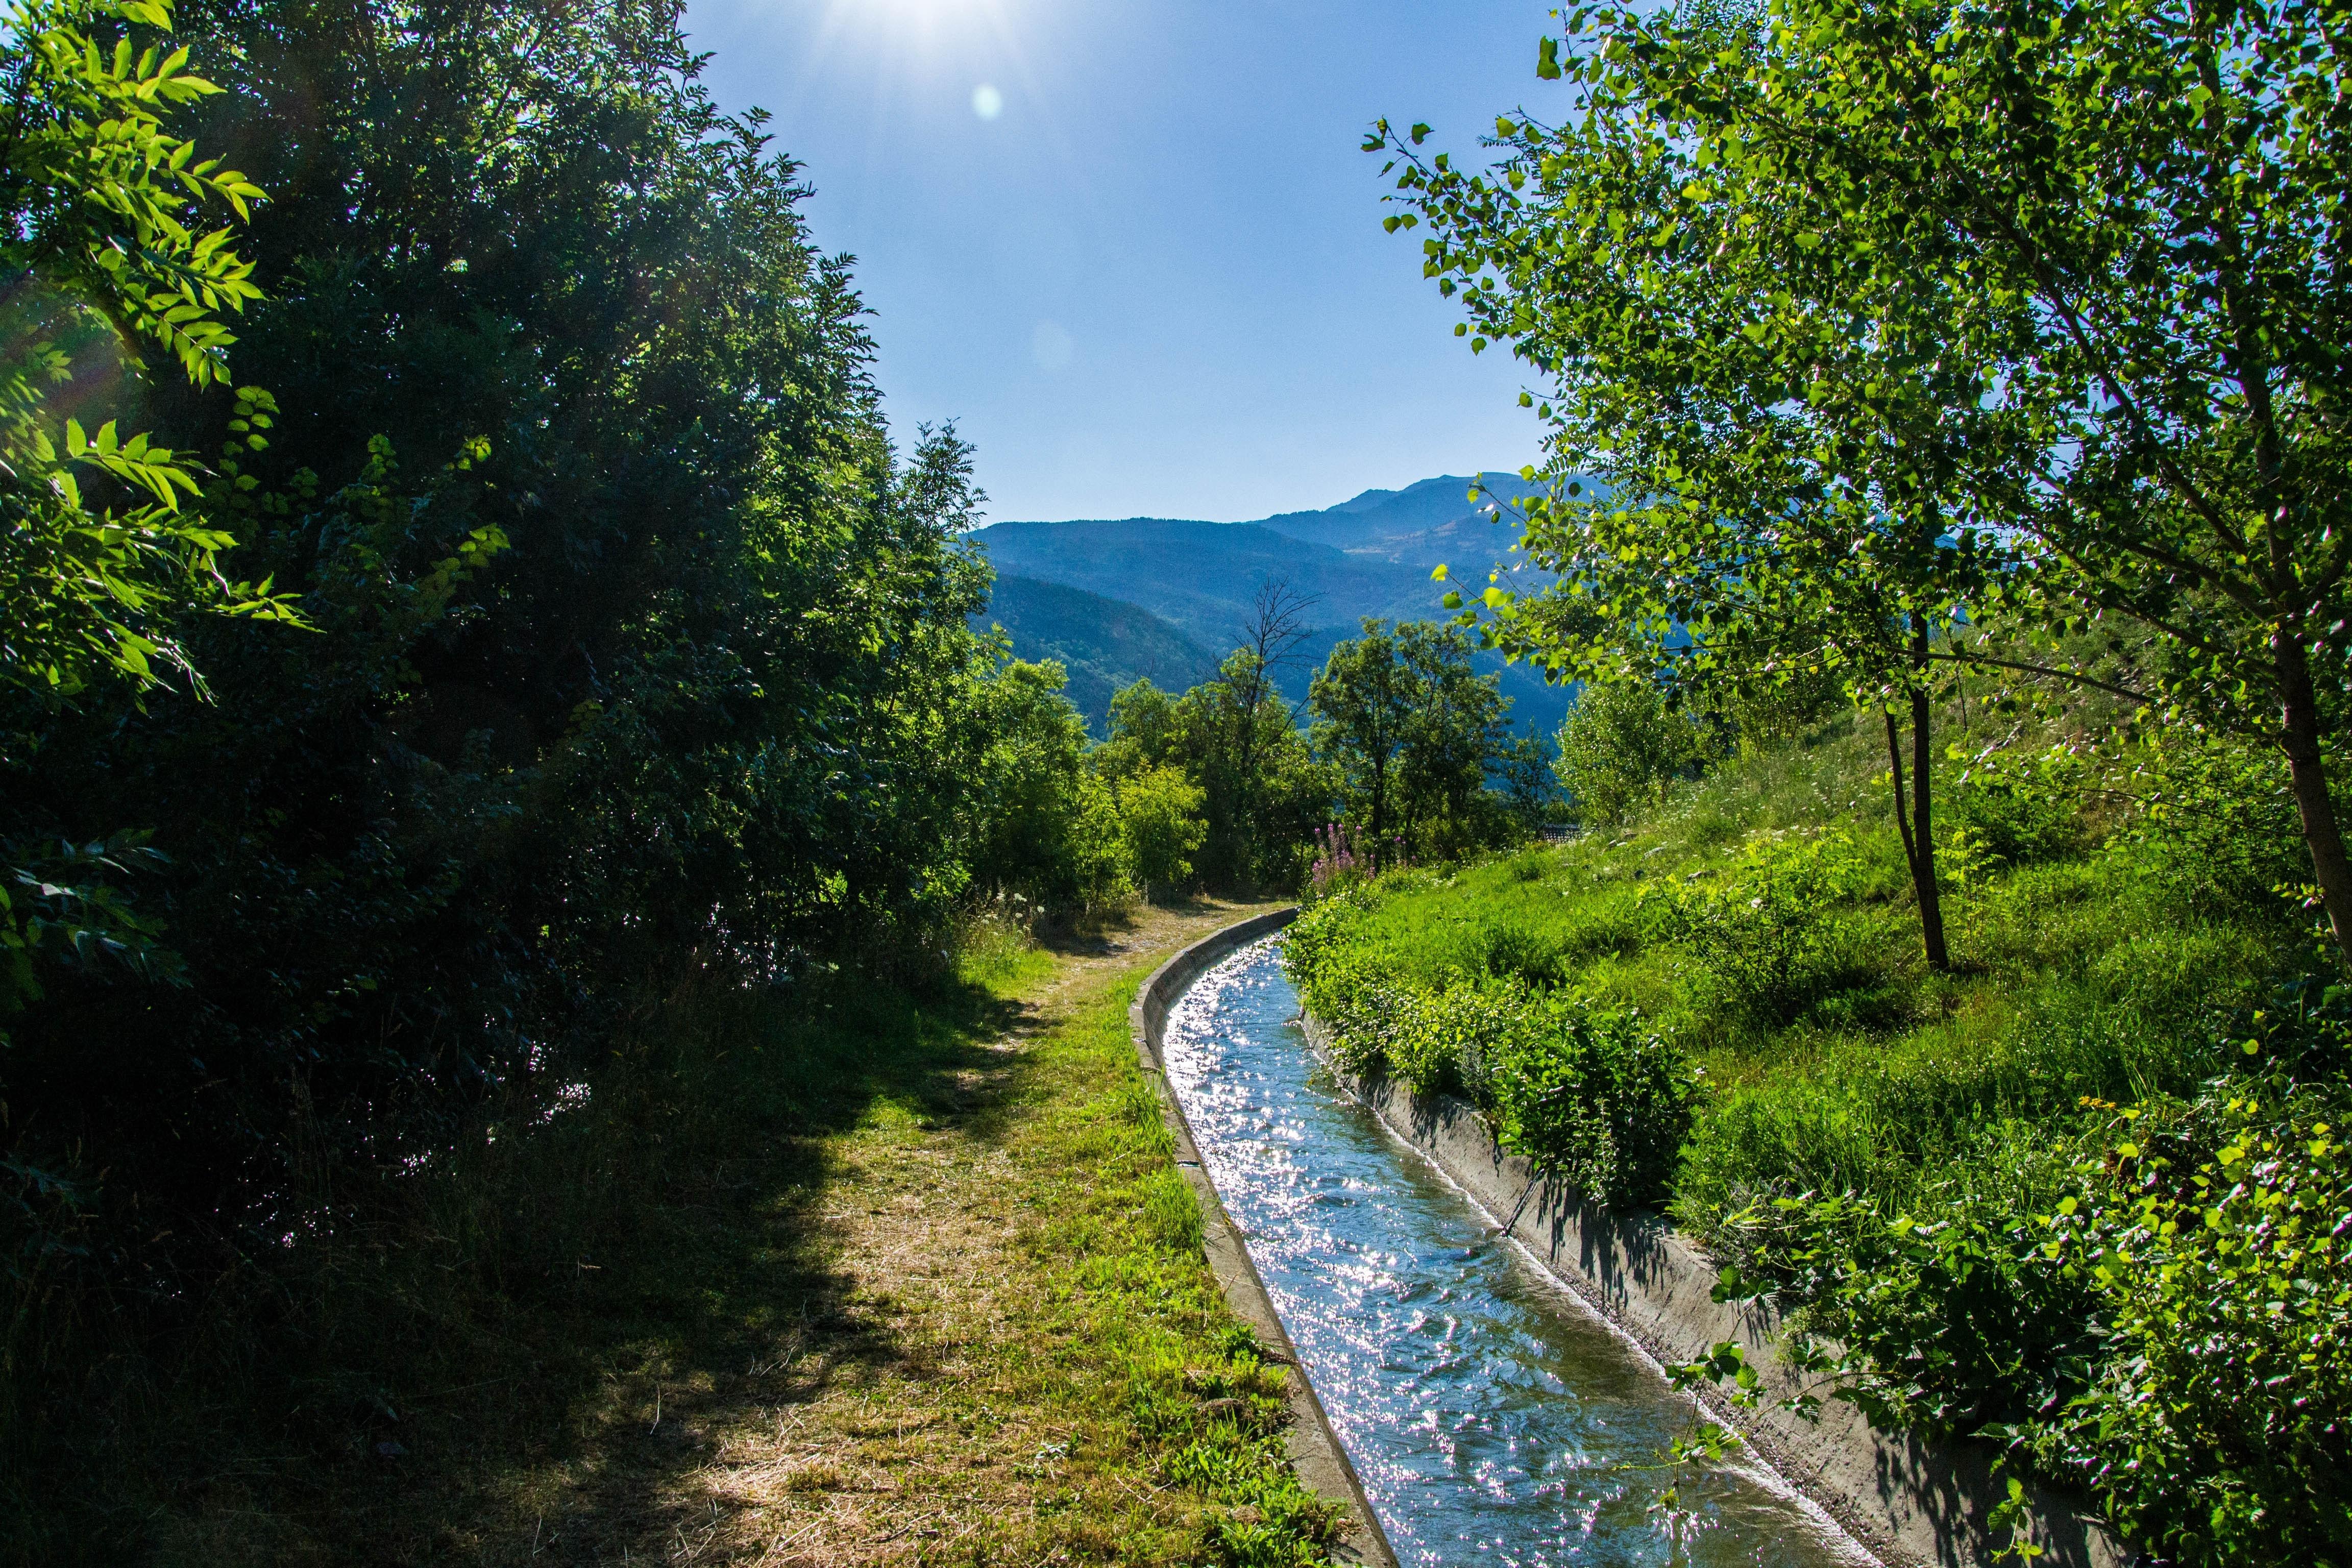 water irrigation system image Peakpx 4608x3072